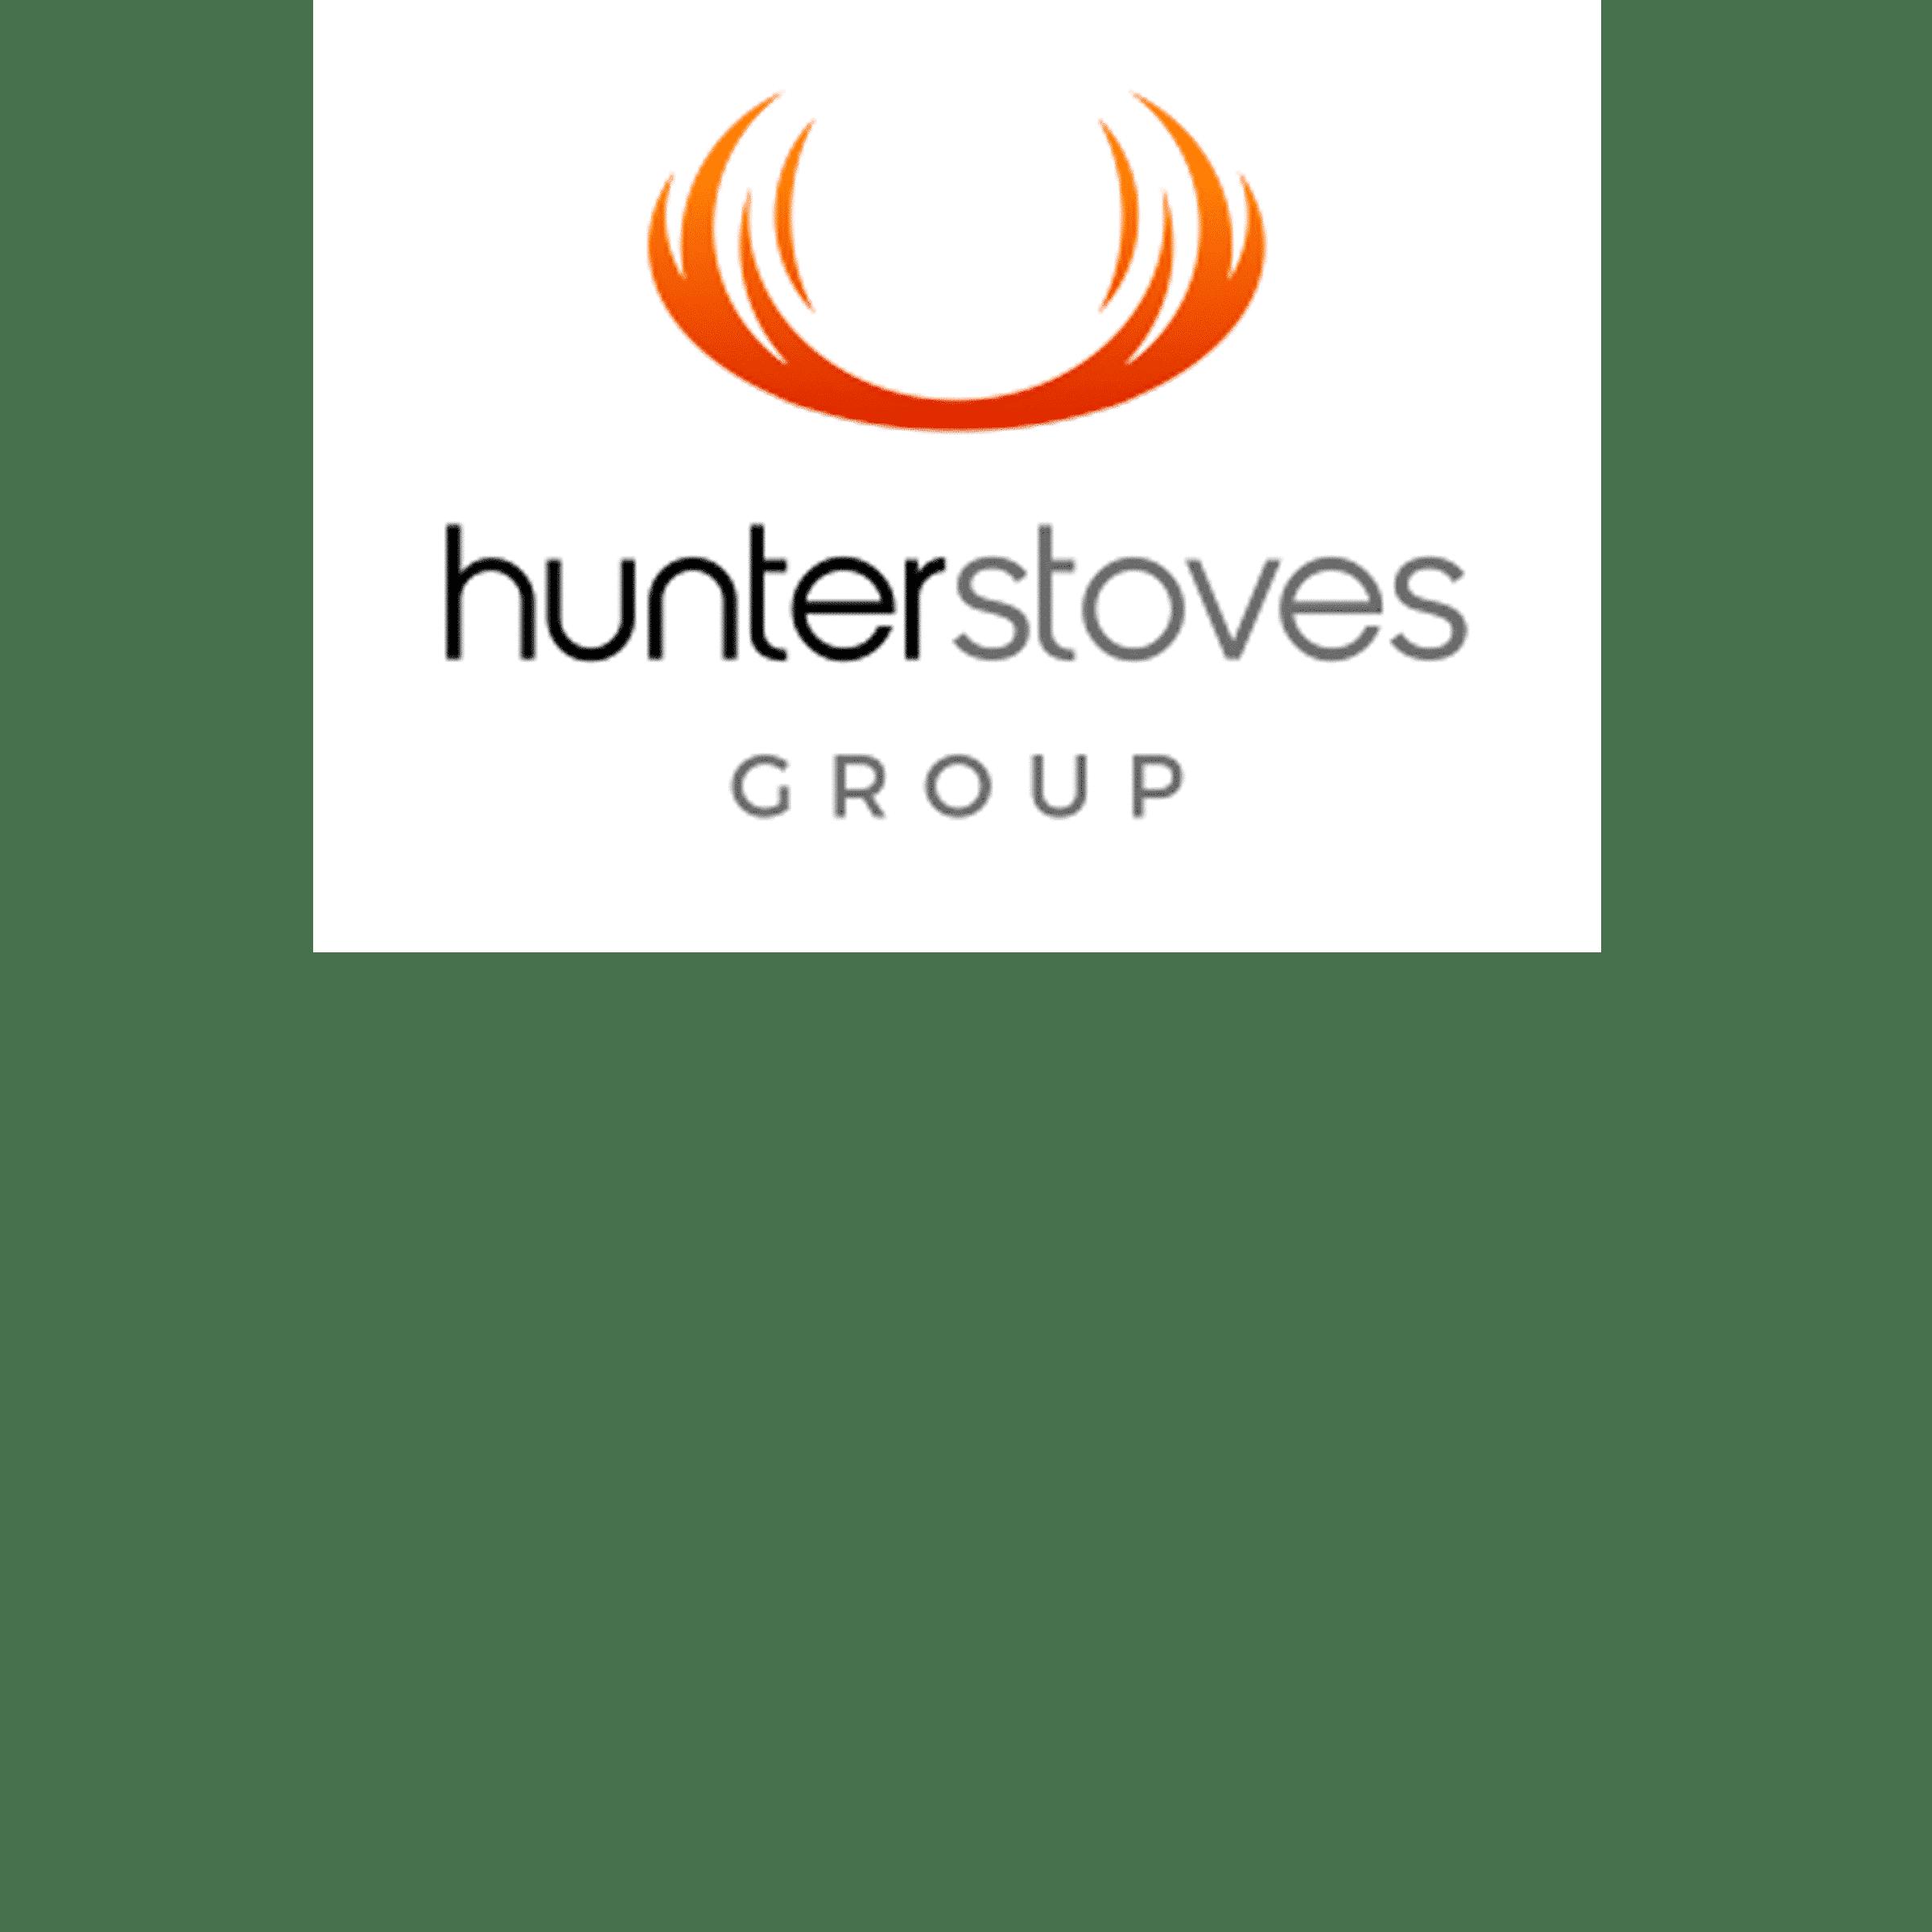 hunterlogo 1